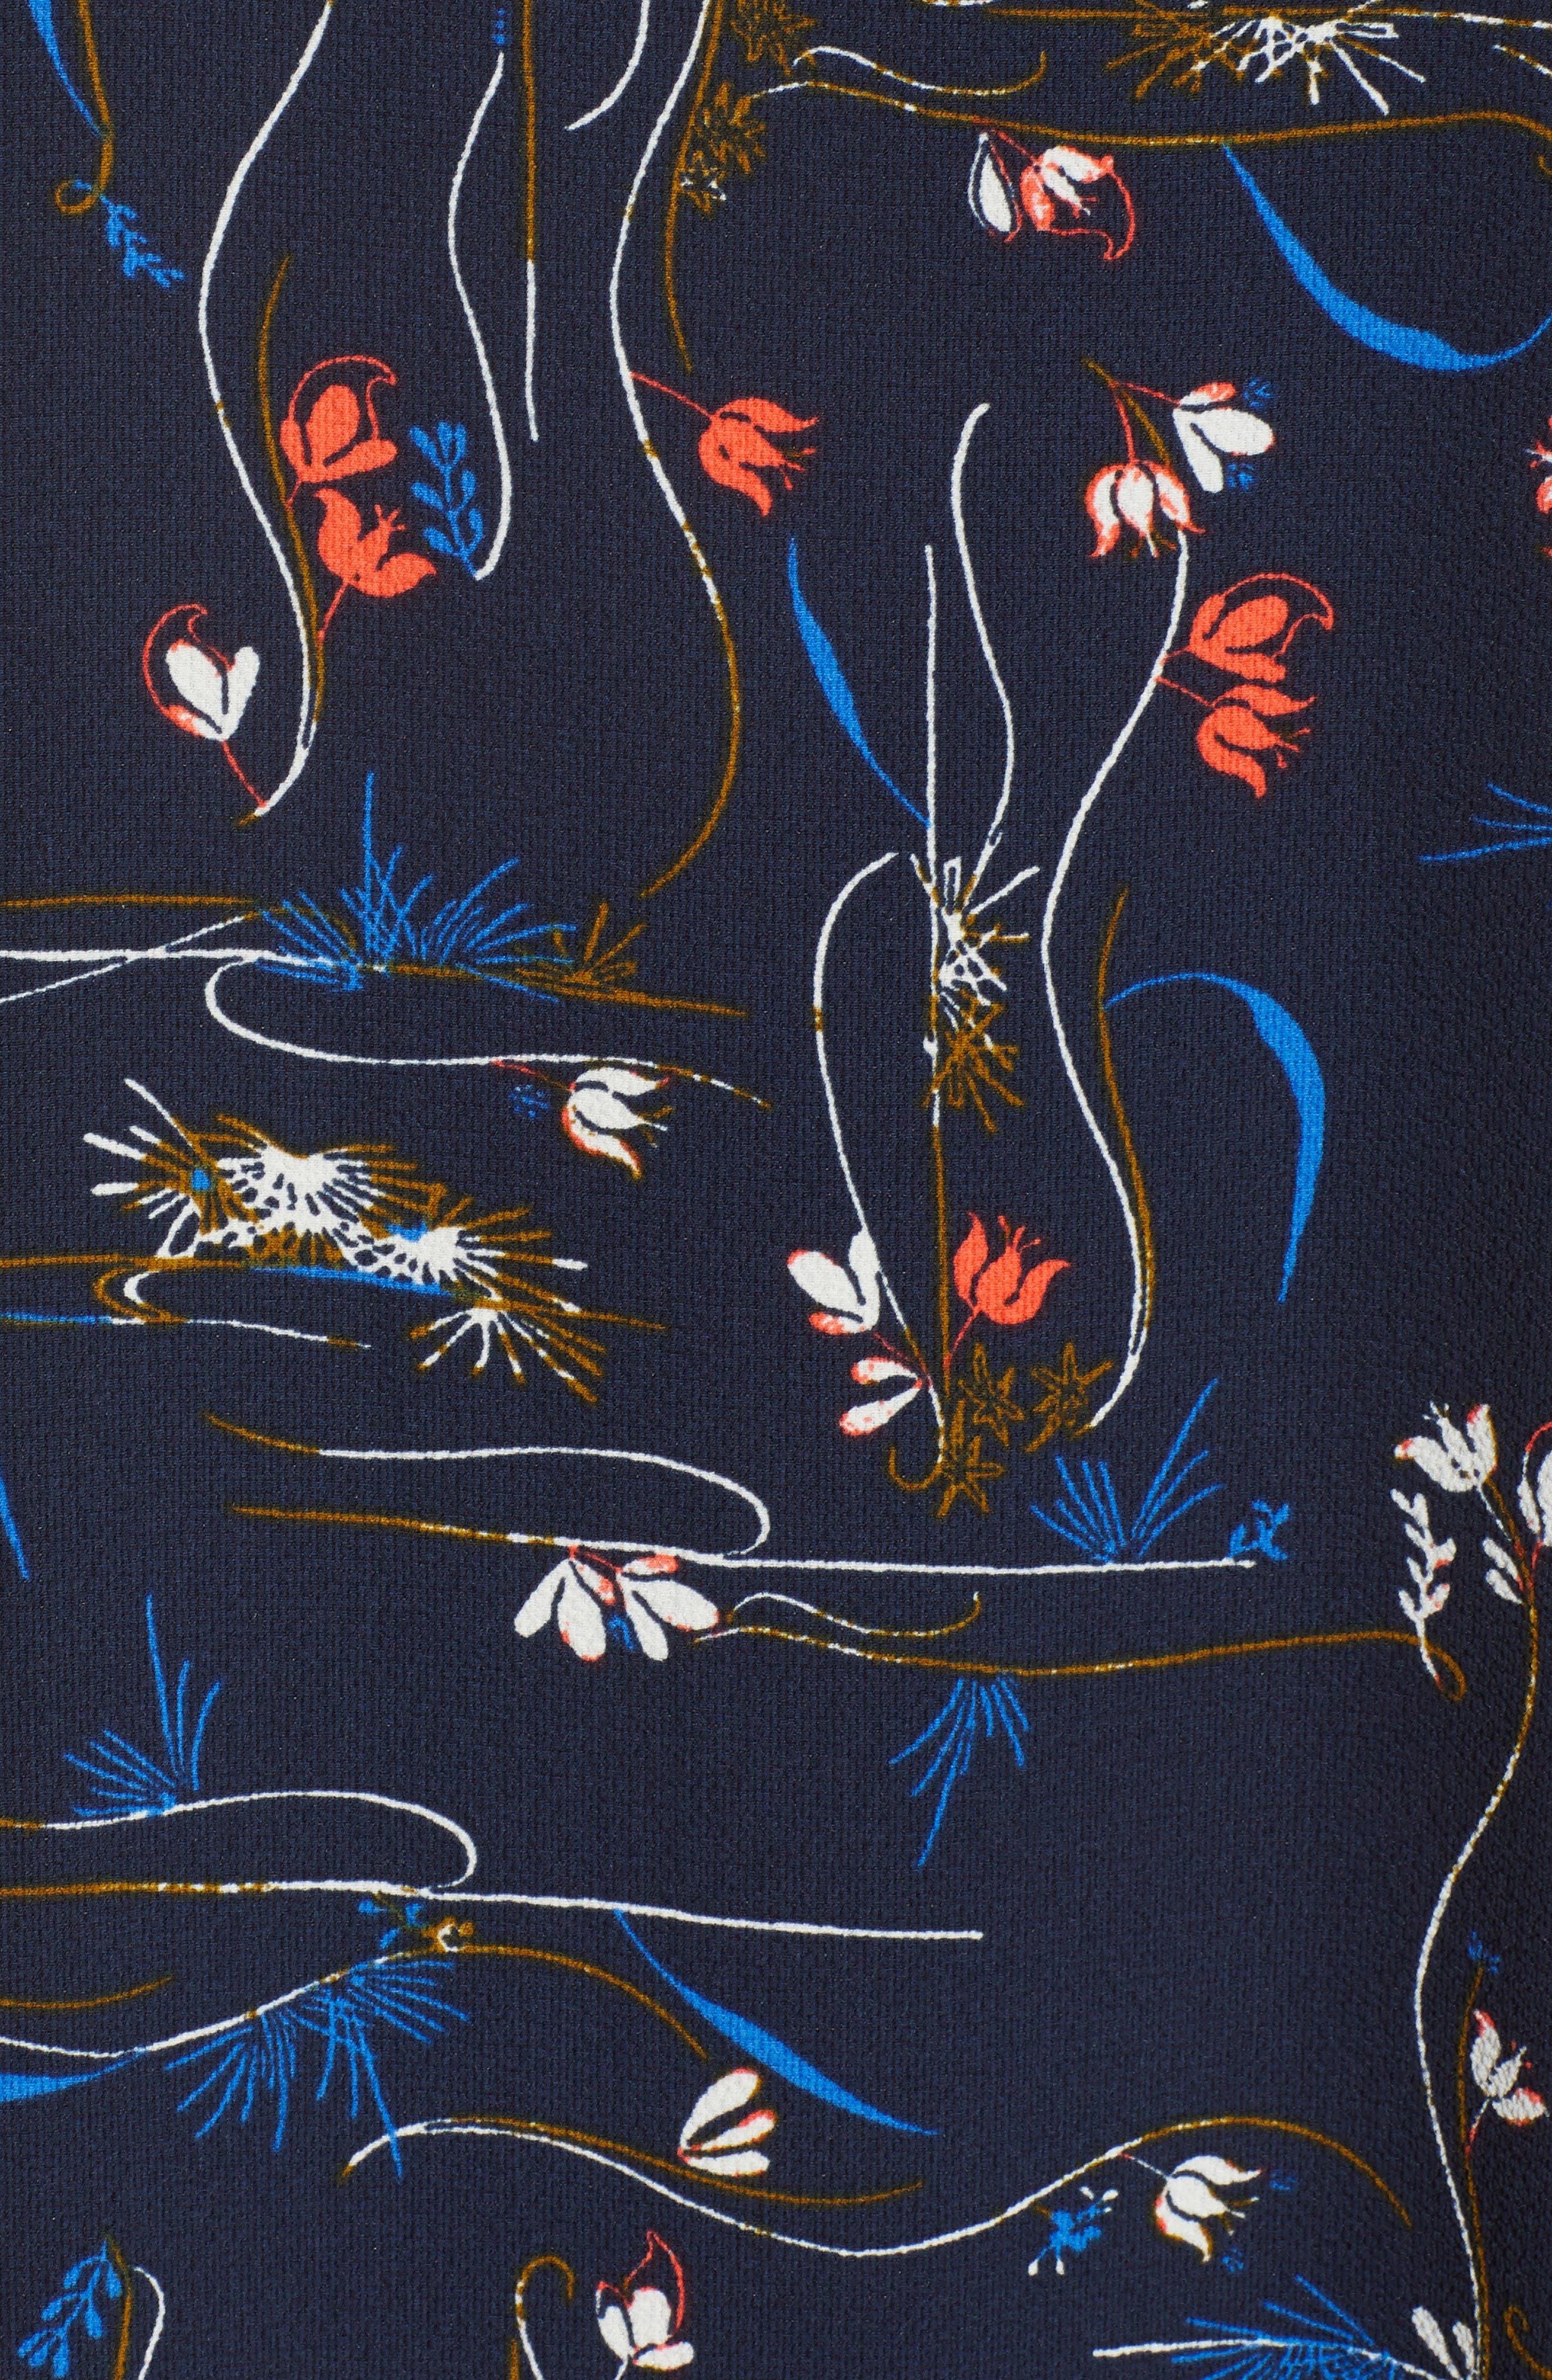 Zipper Back Ruffle Dress,                             Alternate thumbnail 6, color,                             410